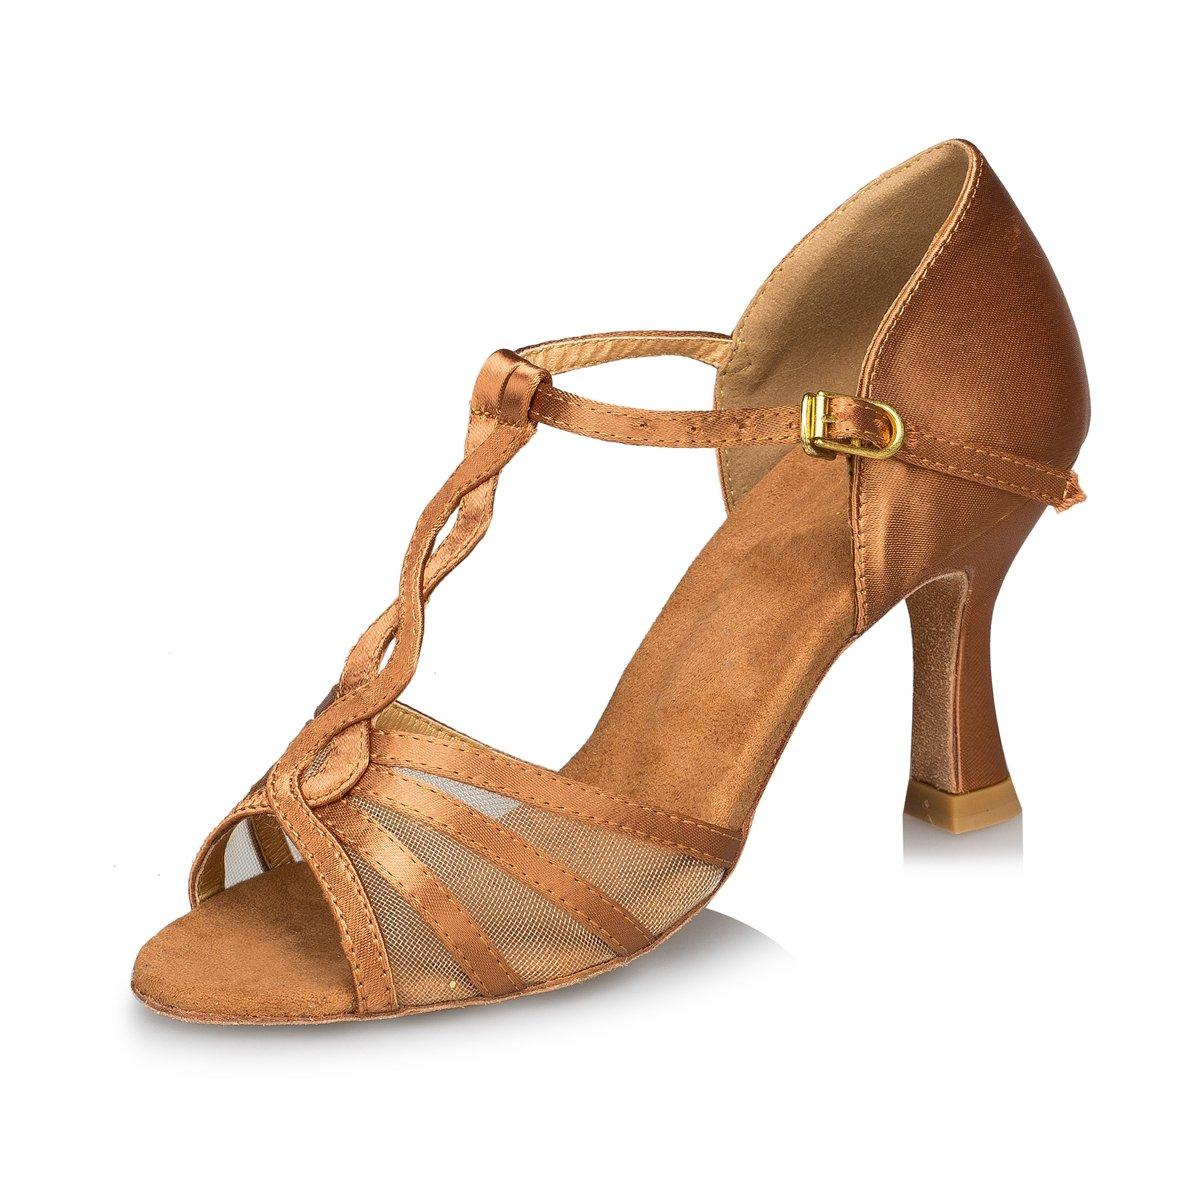 Minitoo , Danse de de Salon femme B071VFNZK2 Brown-7.5cm femme Heel 04597f1 - gis9ma7le.space